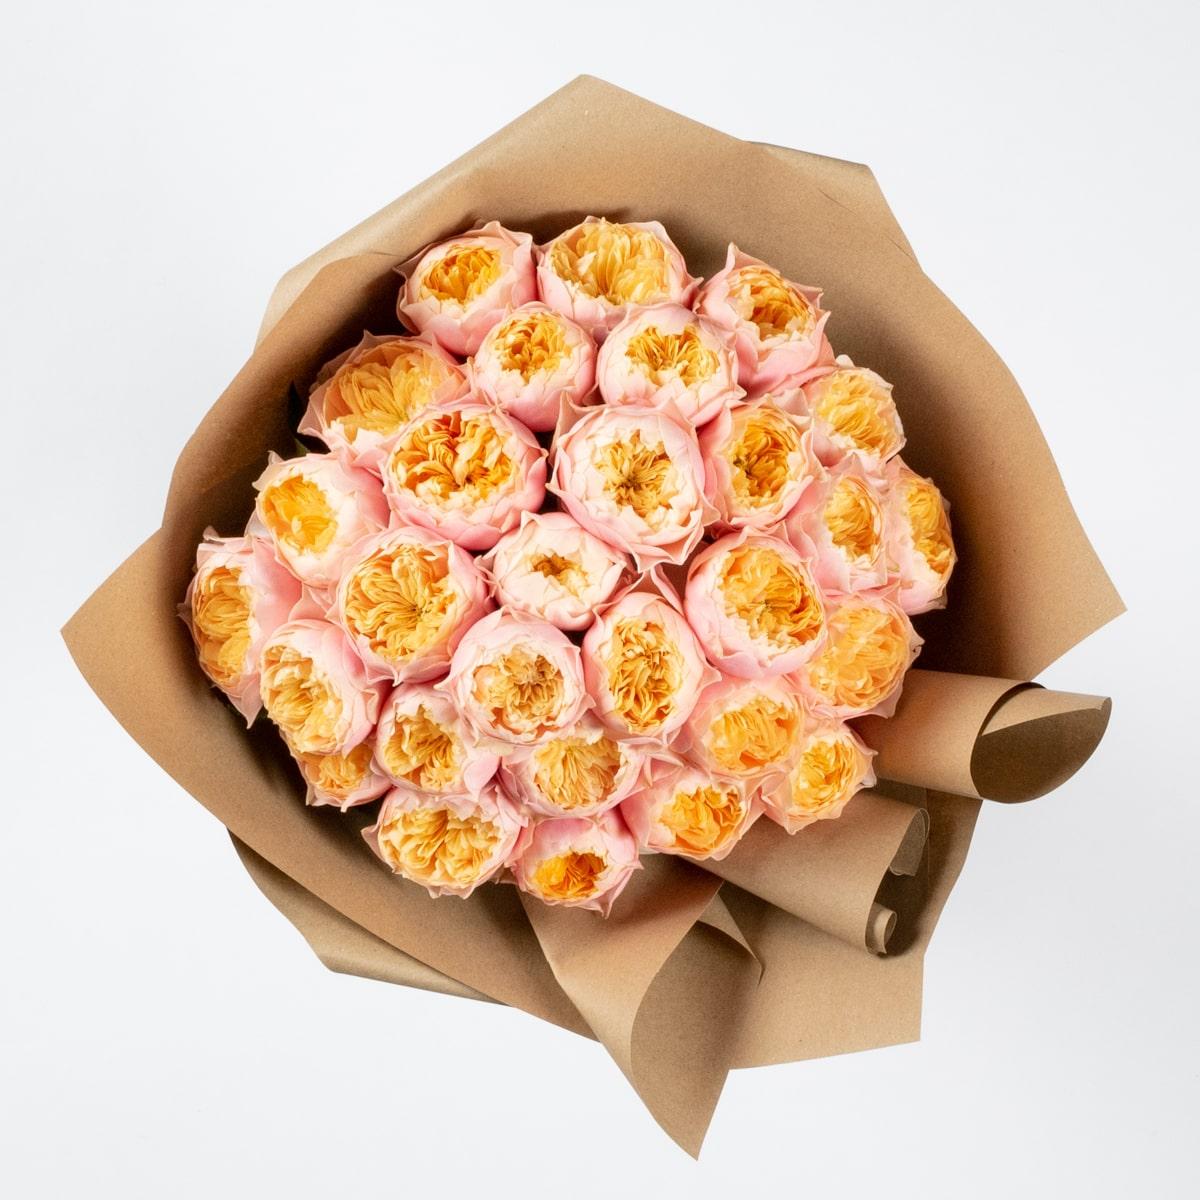 Bloom Flower Delivery | Aberlour Bouquet